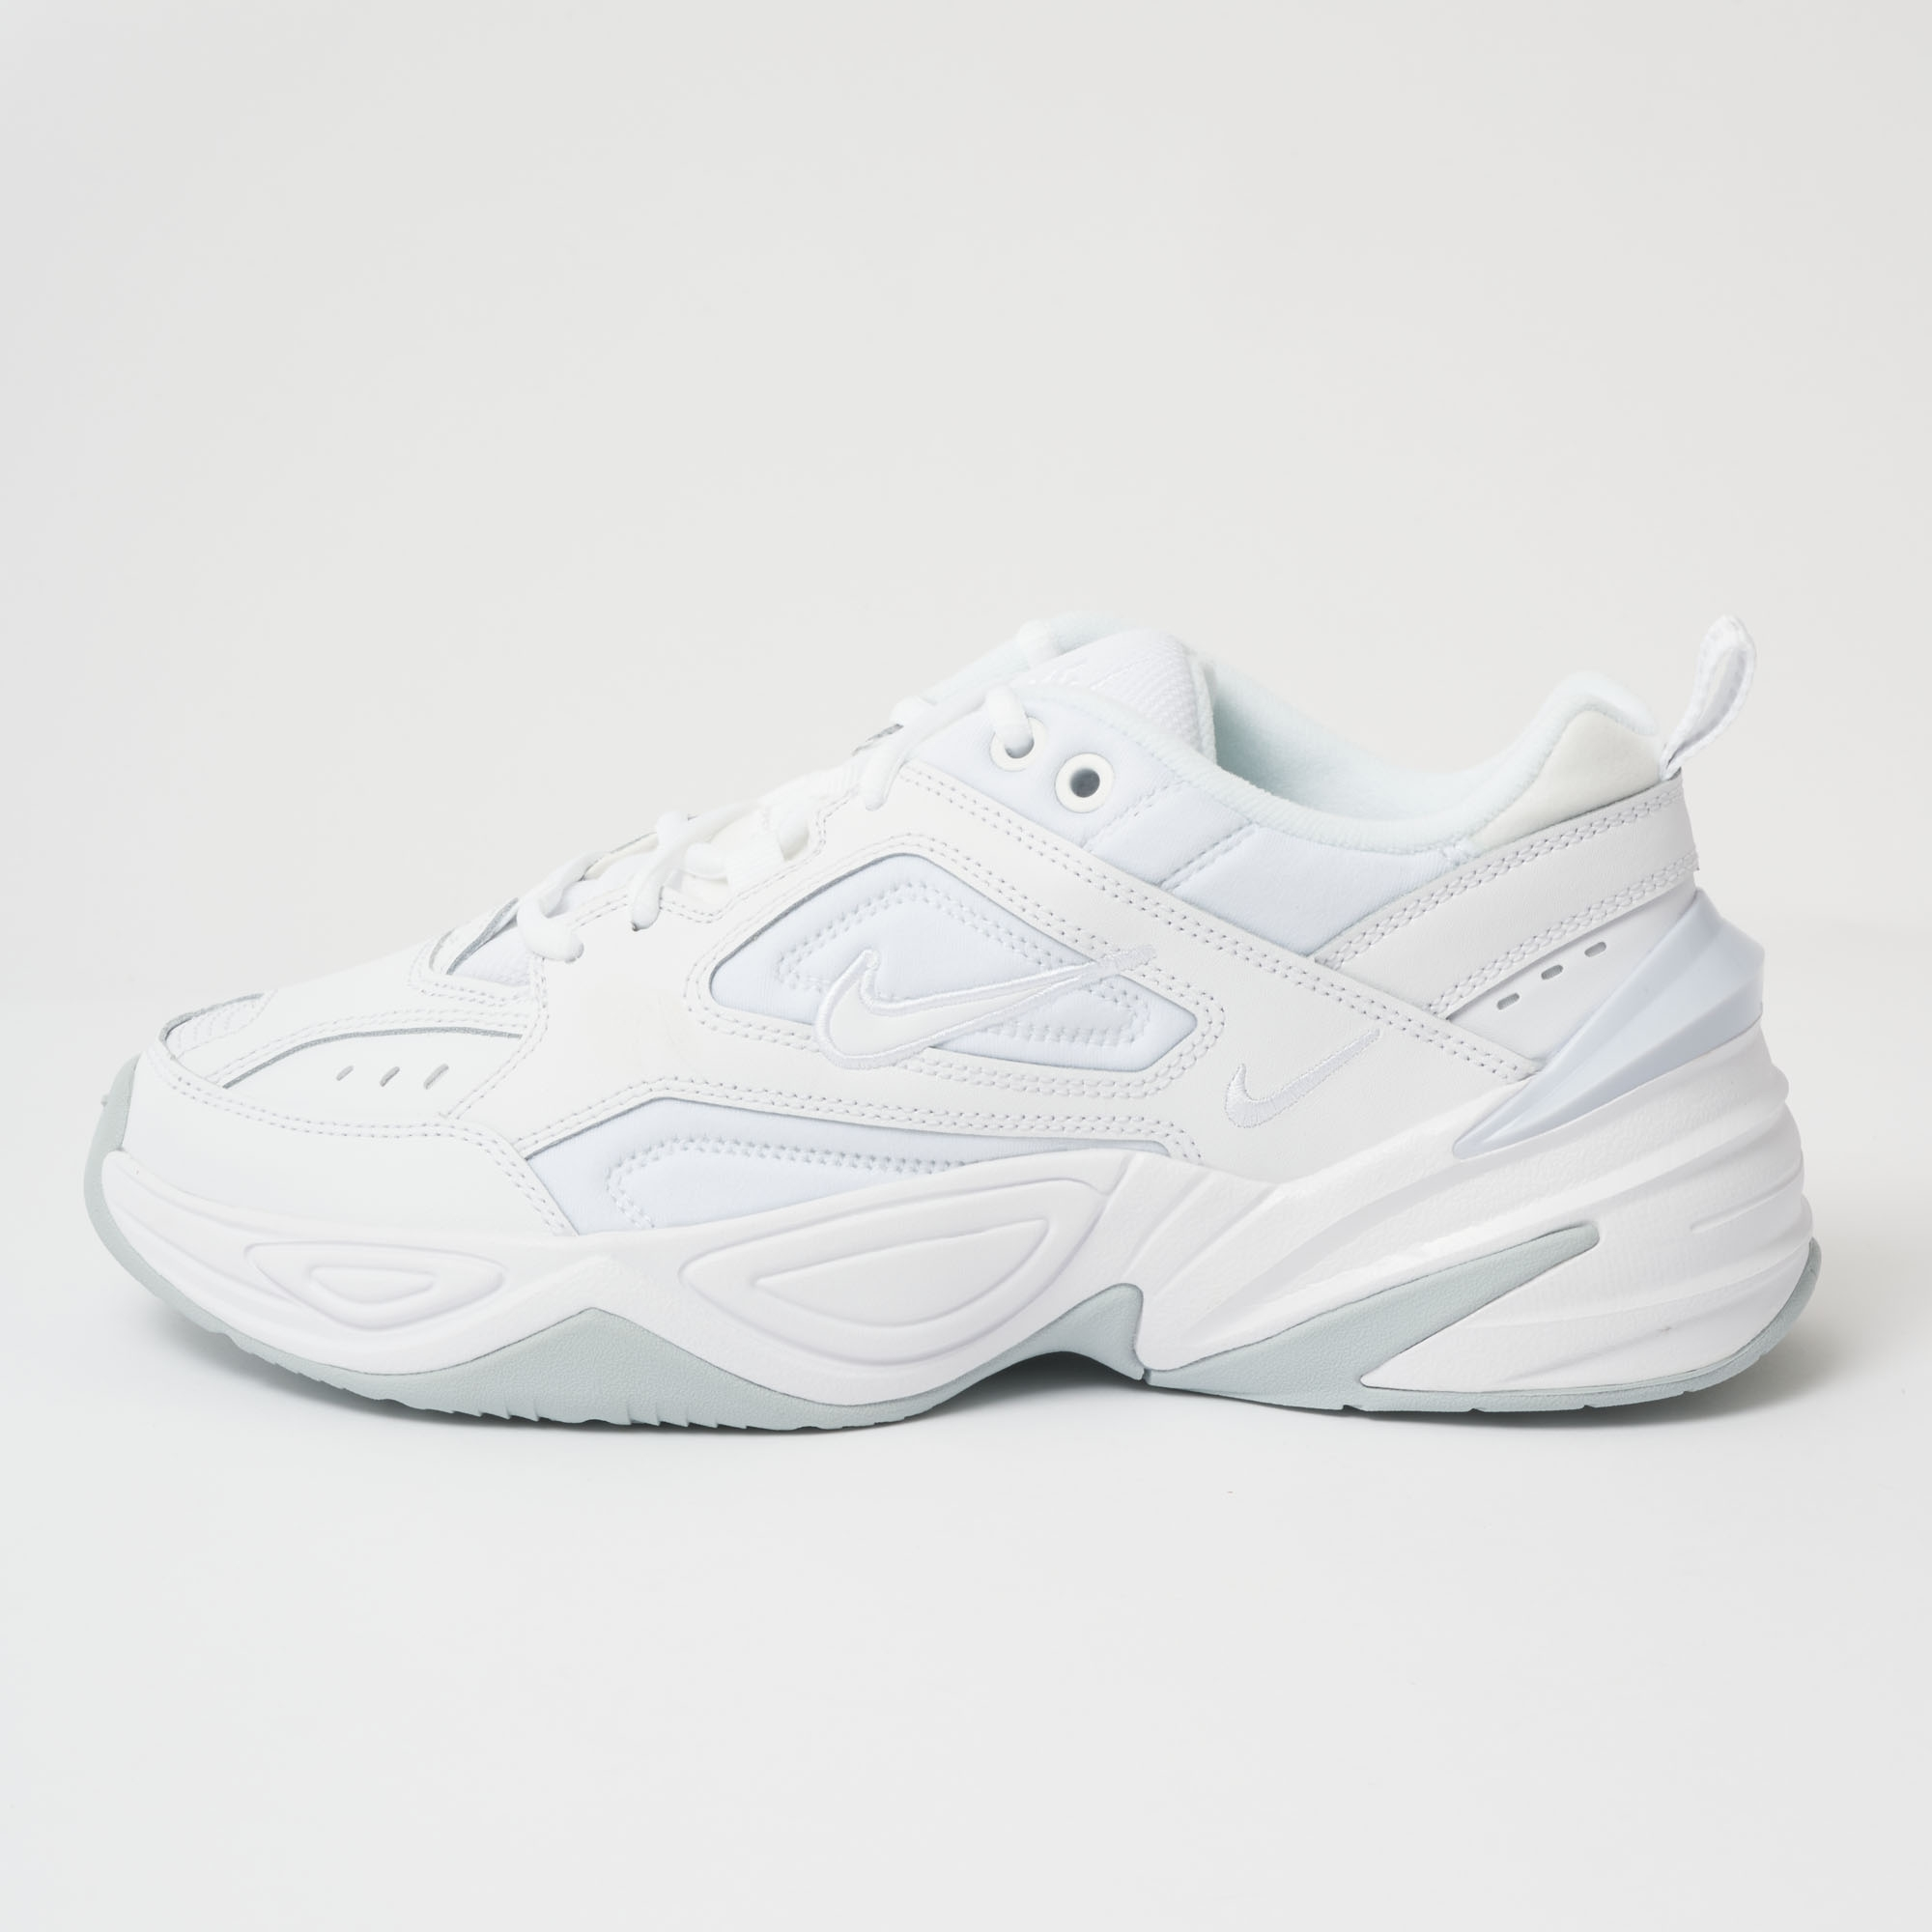 Nike M2K Tekno - White & Pure Platinum